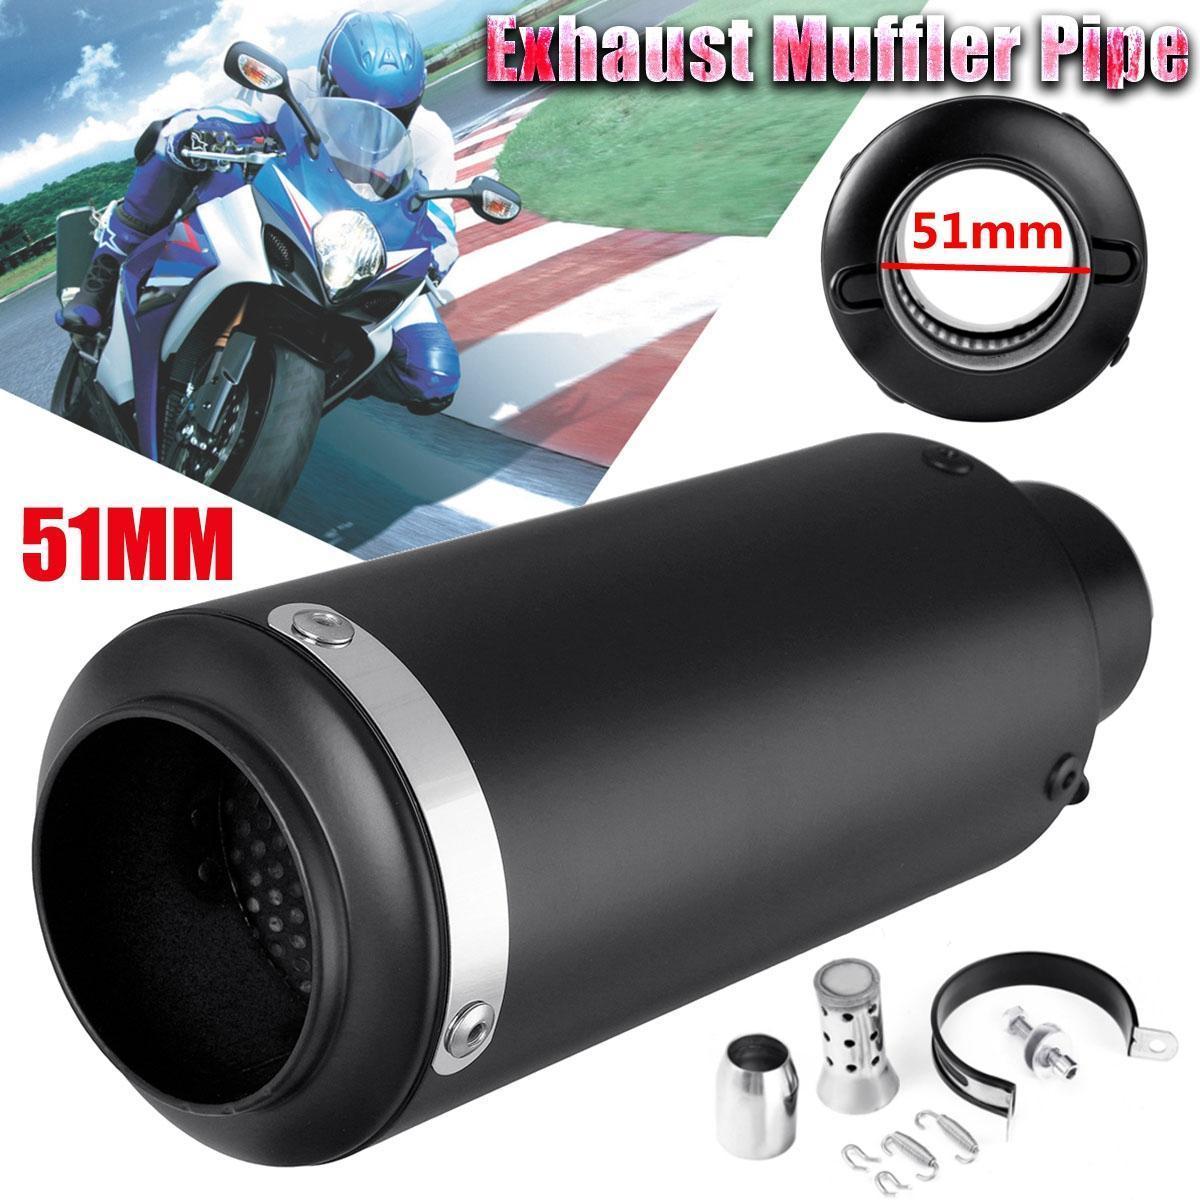 51mm Black Stainless Steel Motorcycle Exhaust Muffler Pipe Silencer Kit